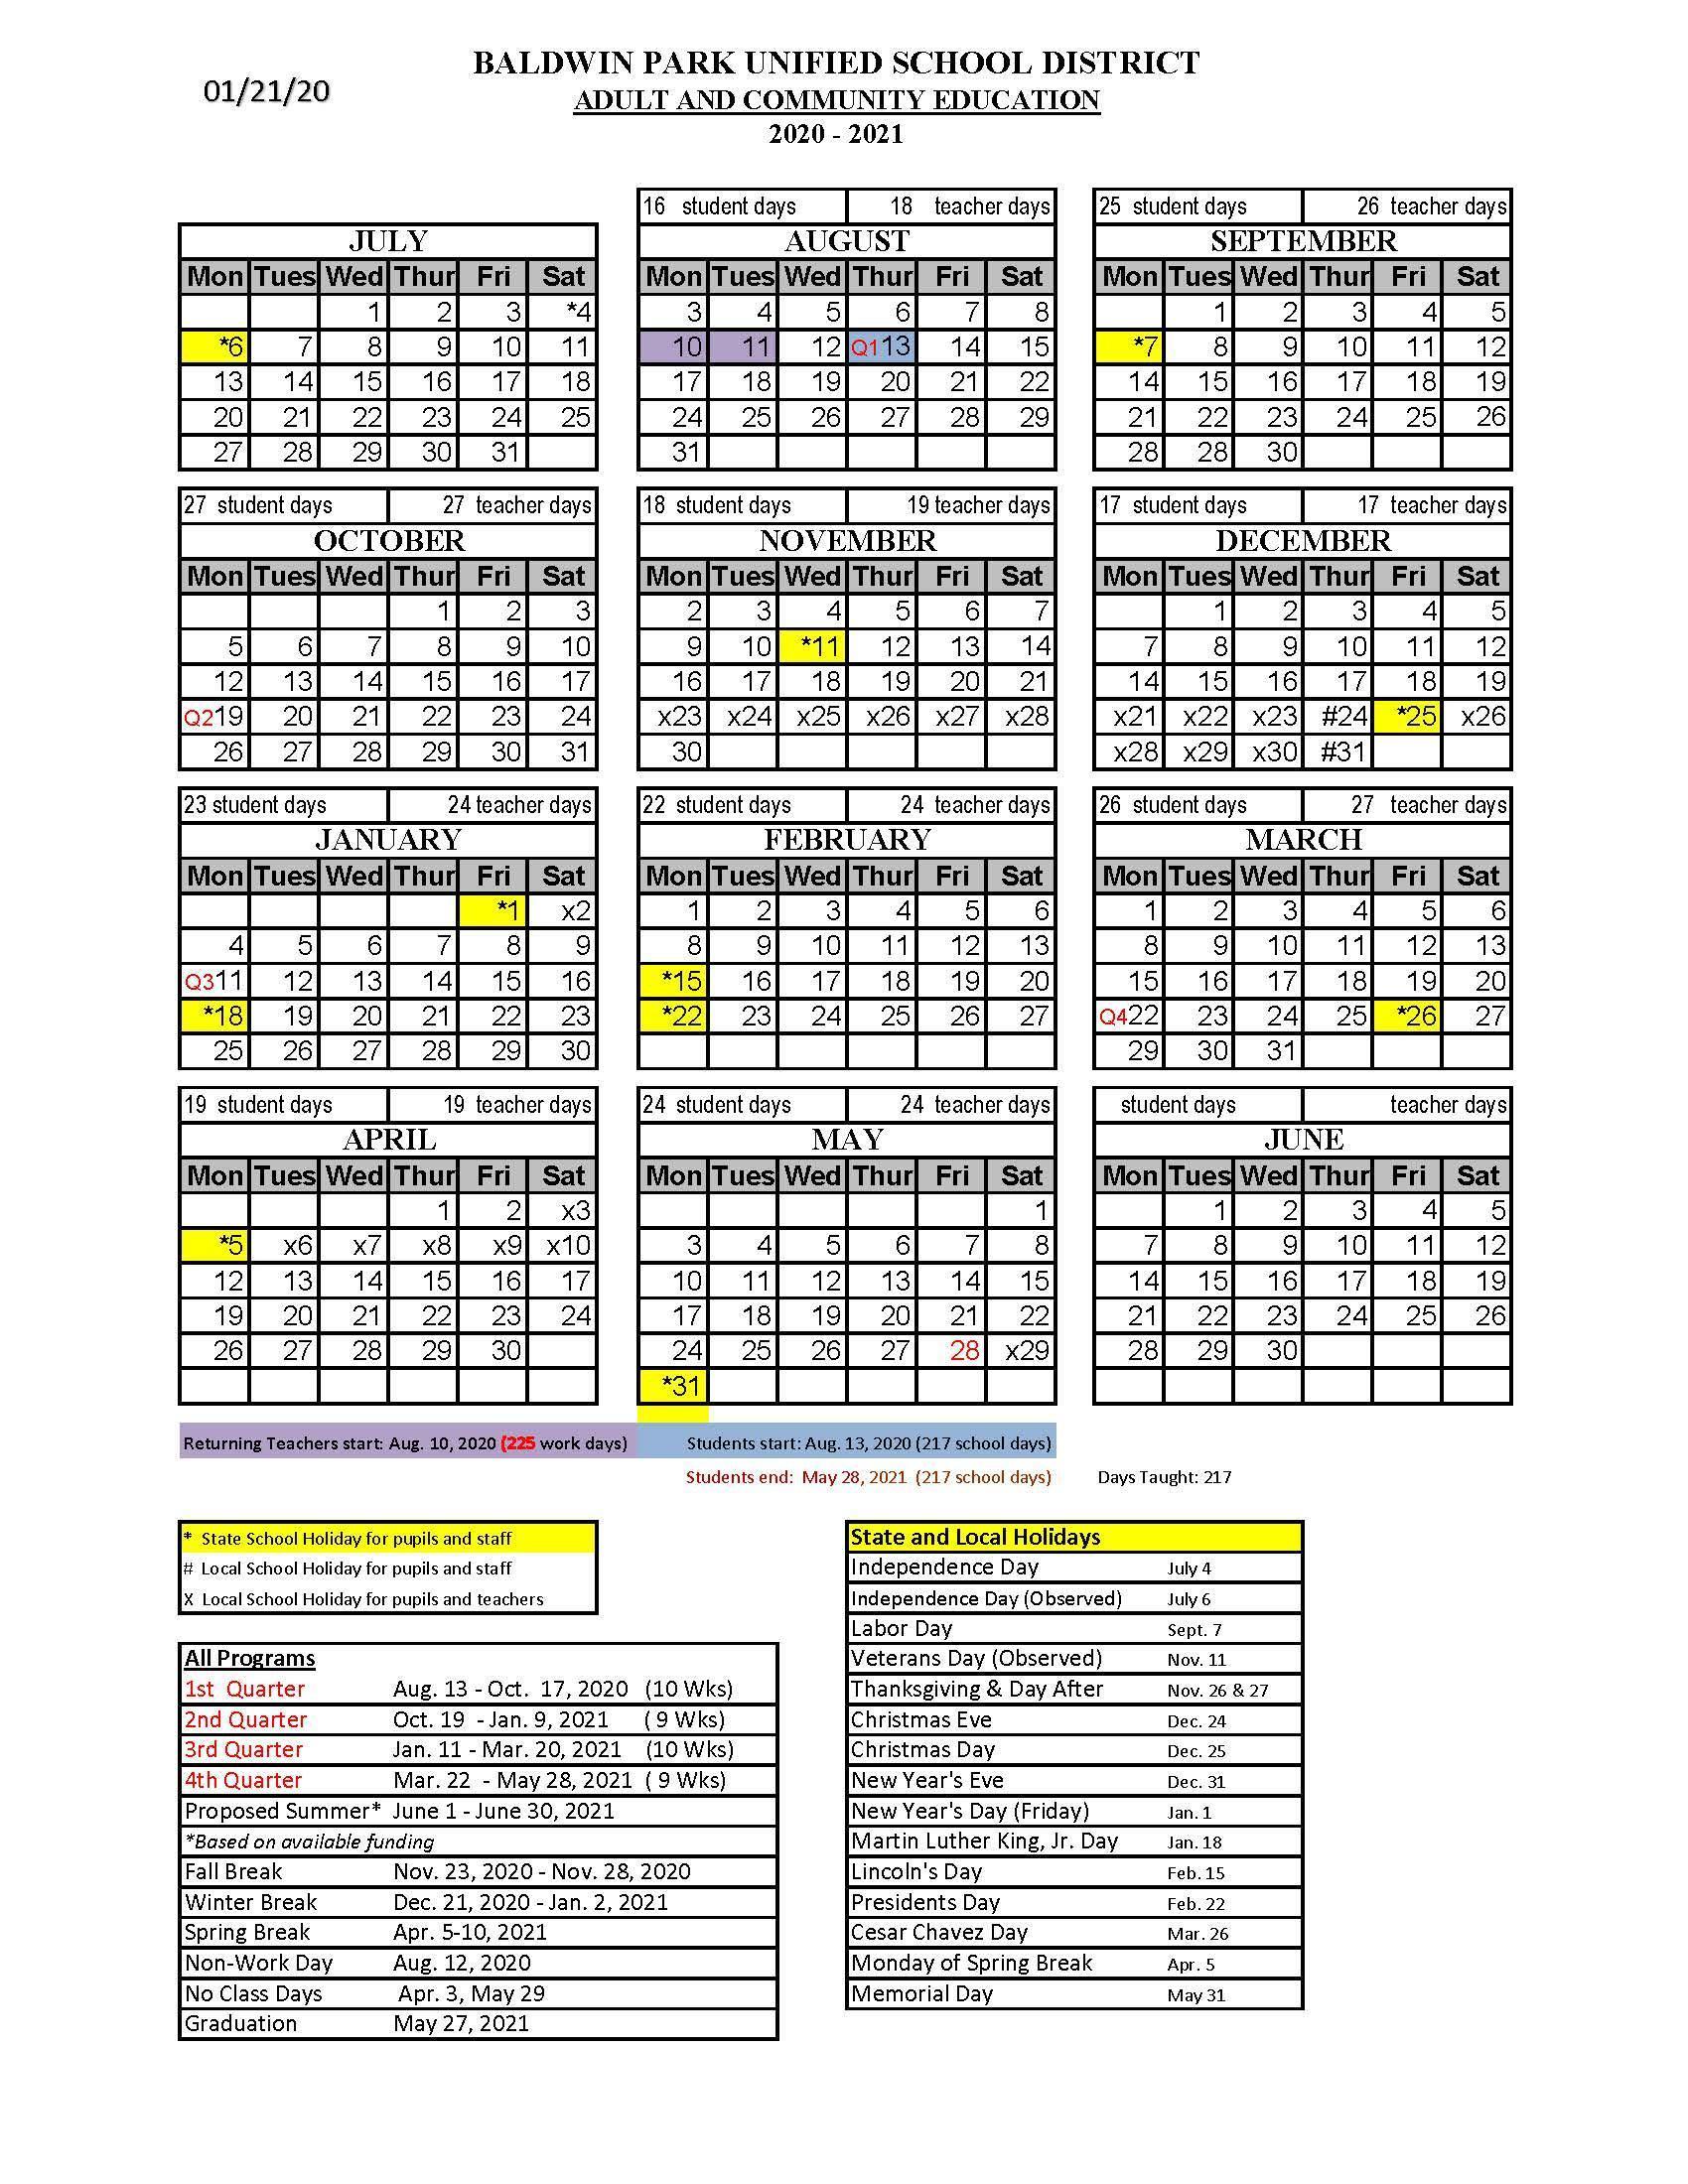 BPACE 2020-2021 School Year Calendar